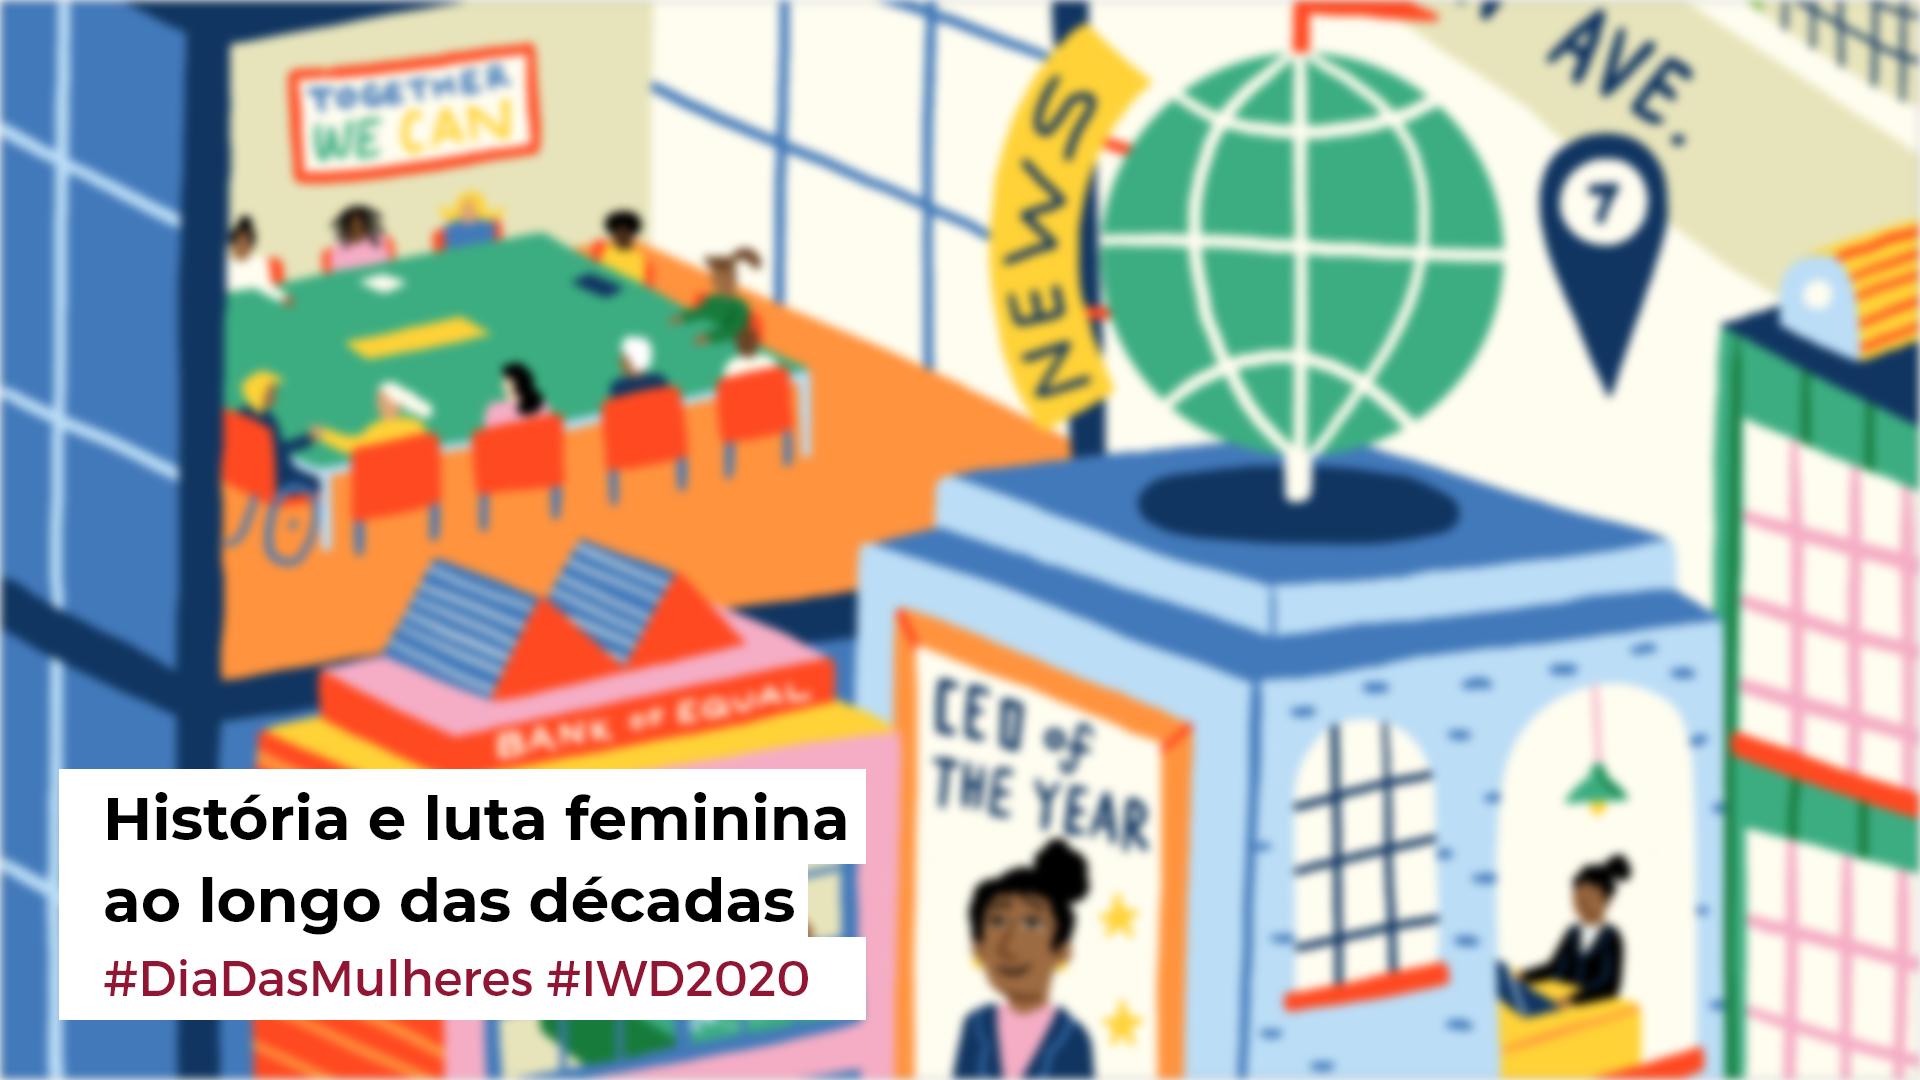 Dia Internacional da Mulher 2020 - CroSoften